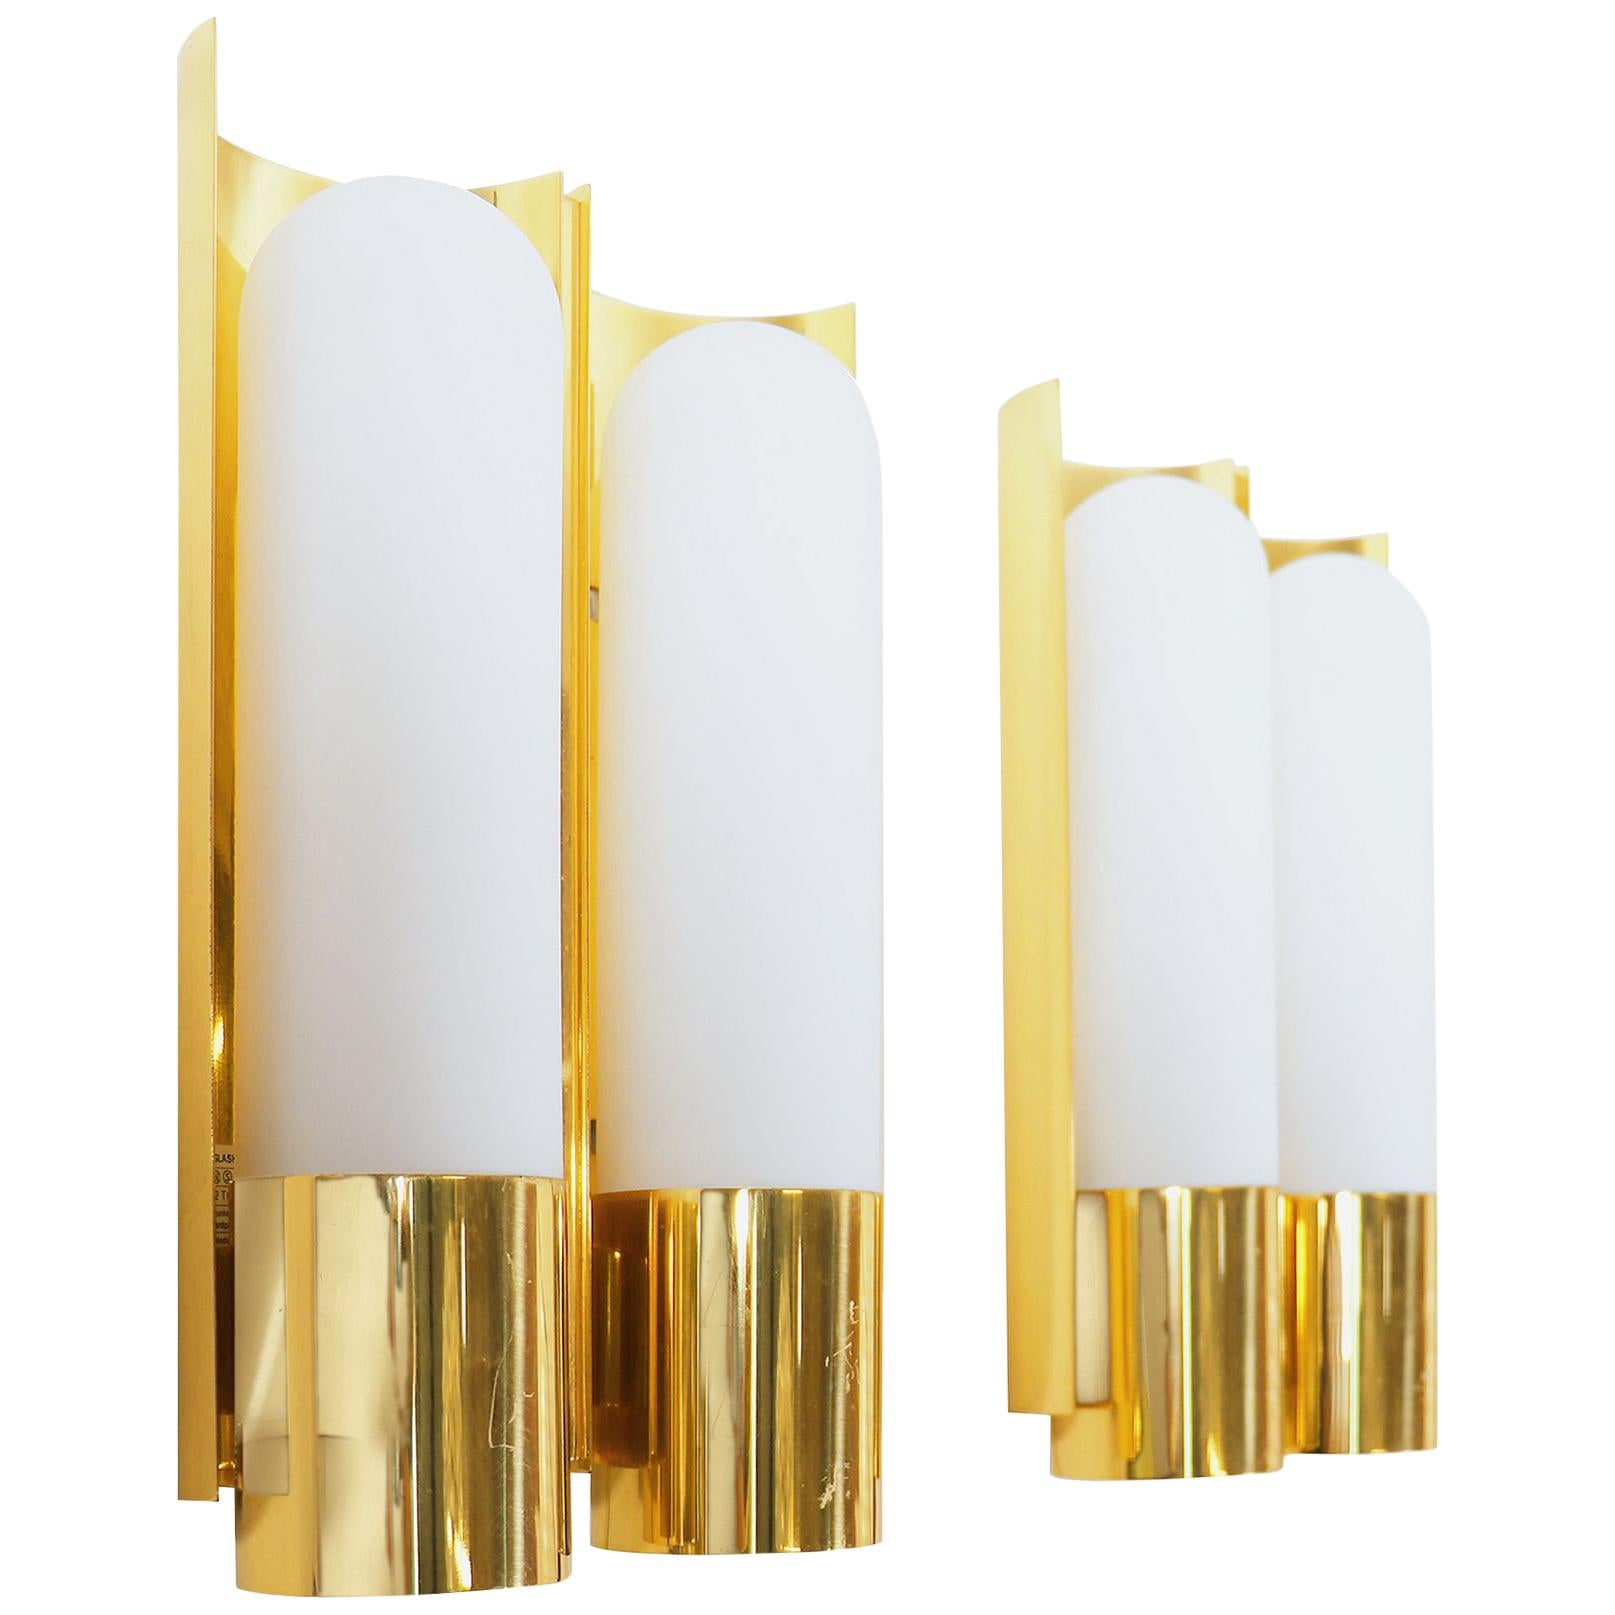 1970 Germany Limburg Pair of Double Wall Lights Opaline Glass & Brass